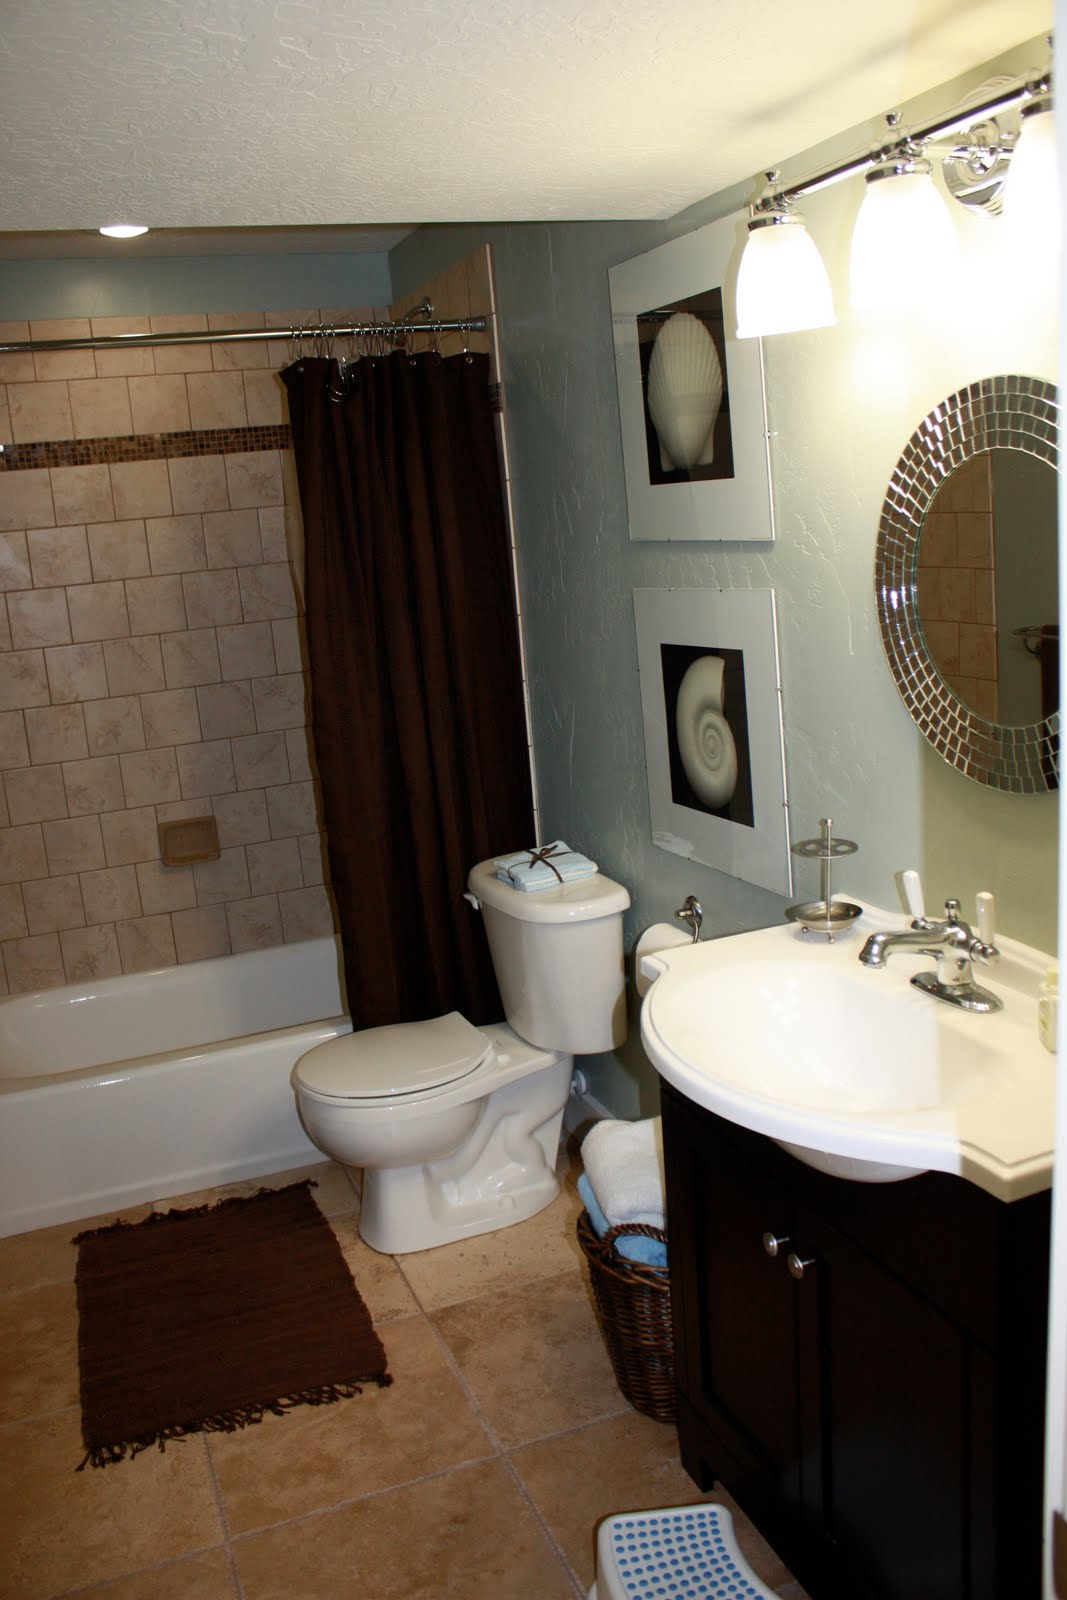 enchanting-bathroom-ideas-decorating-lovely-decor-of-small-bathroom-interior-design